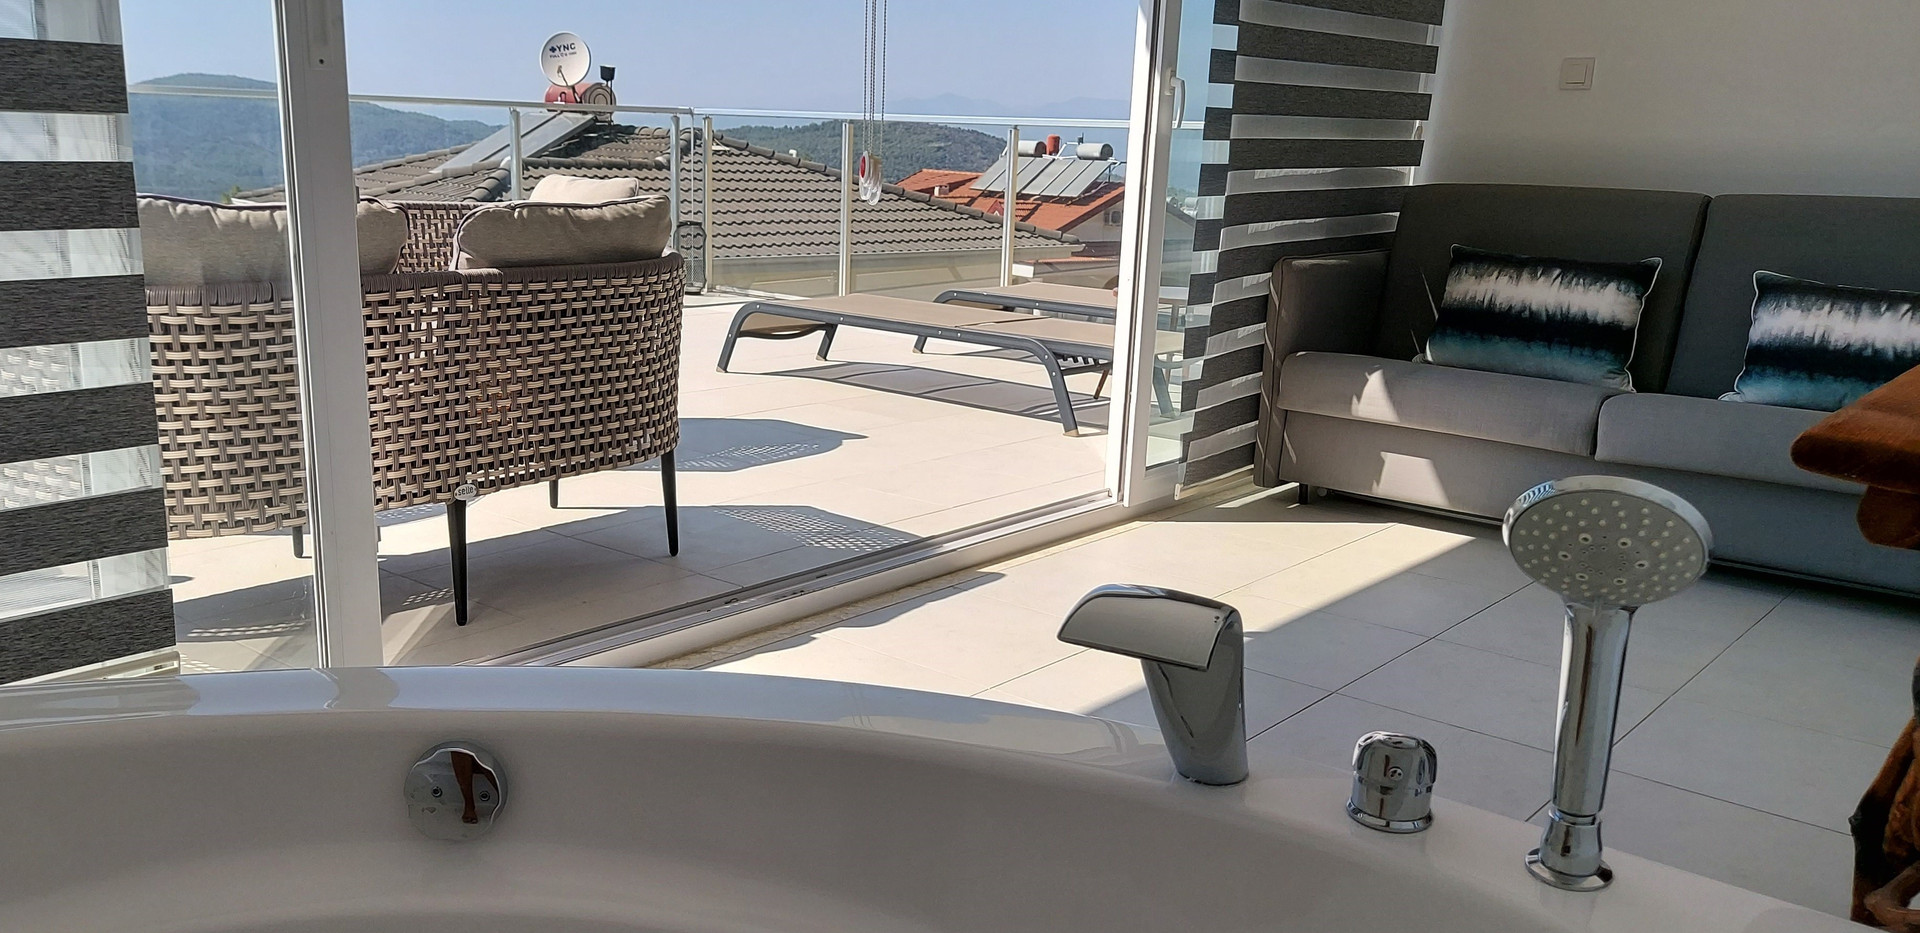 Jacuzzi Bath in Master Bedroom